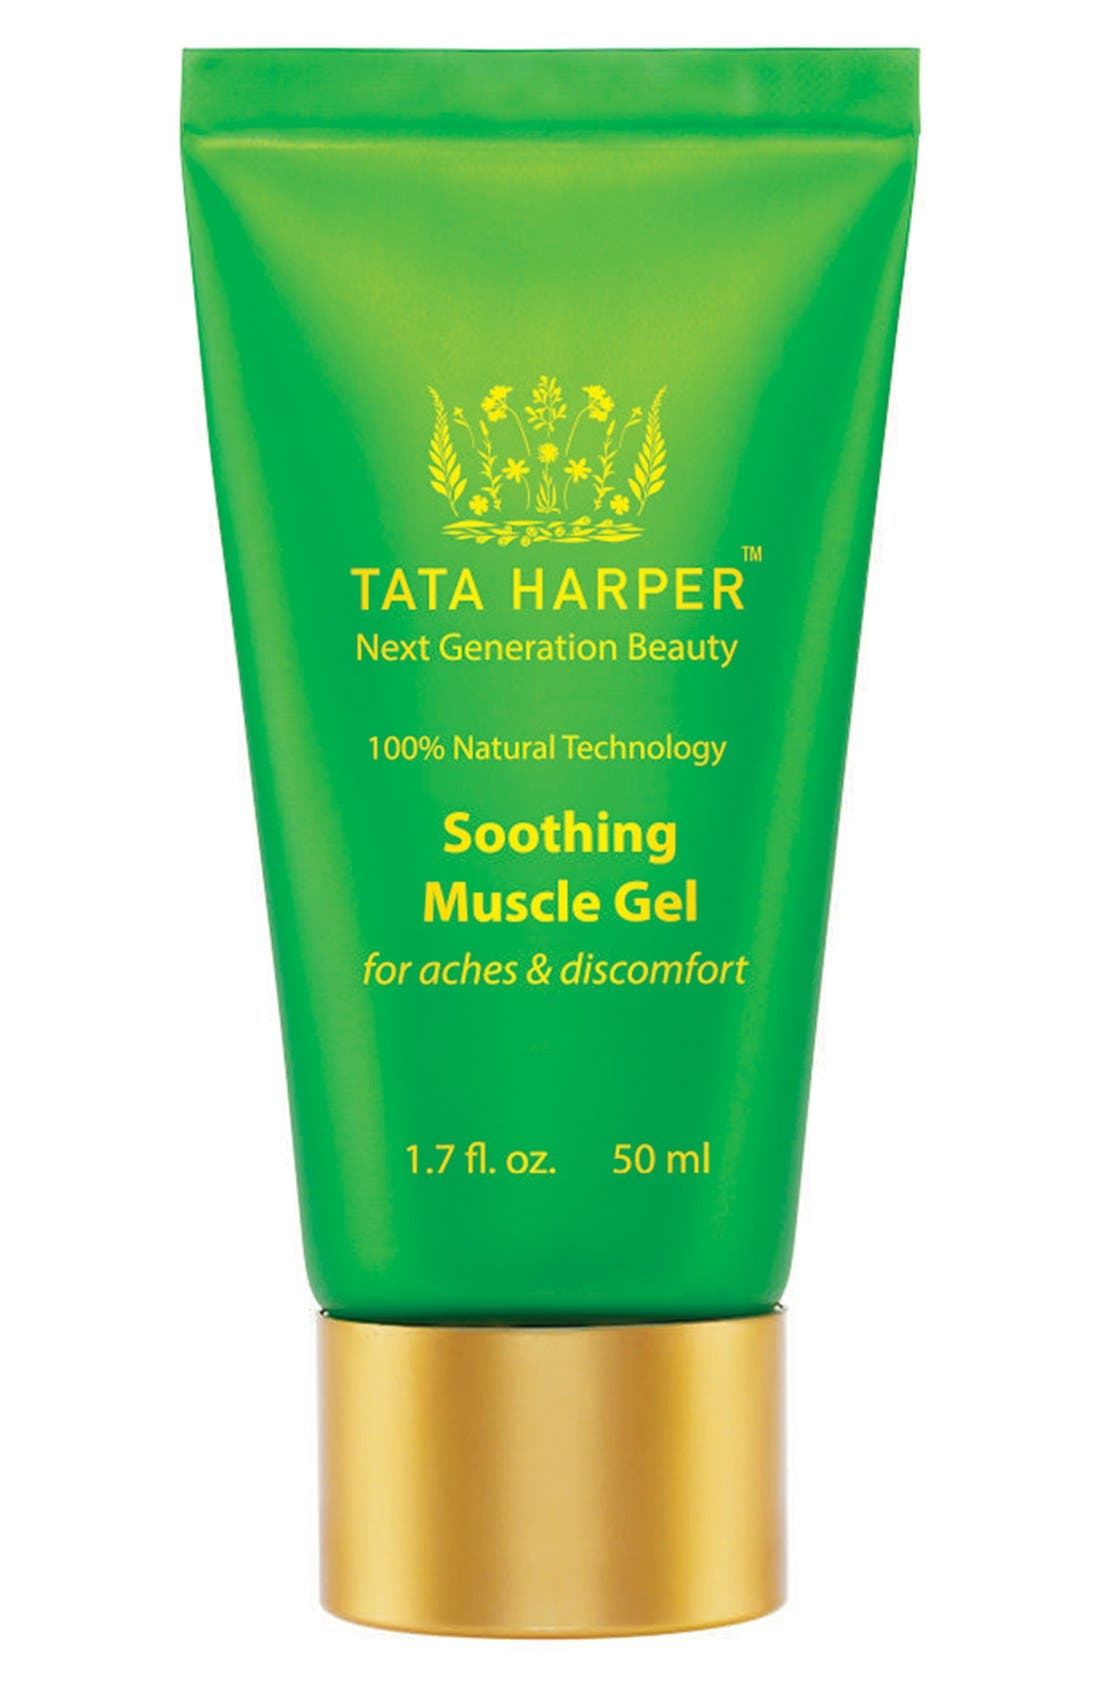 Tata Harper Skincare Soothing Muscle Gel